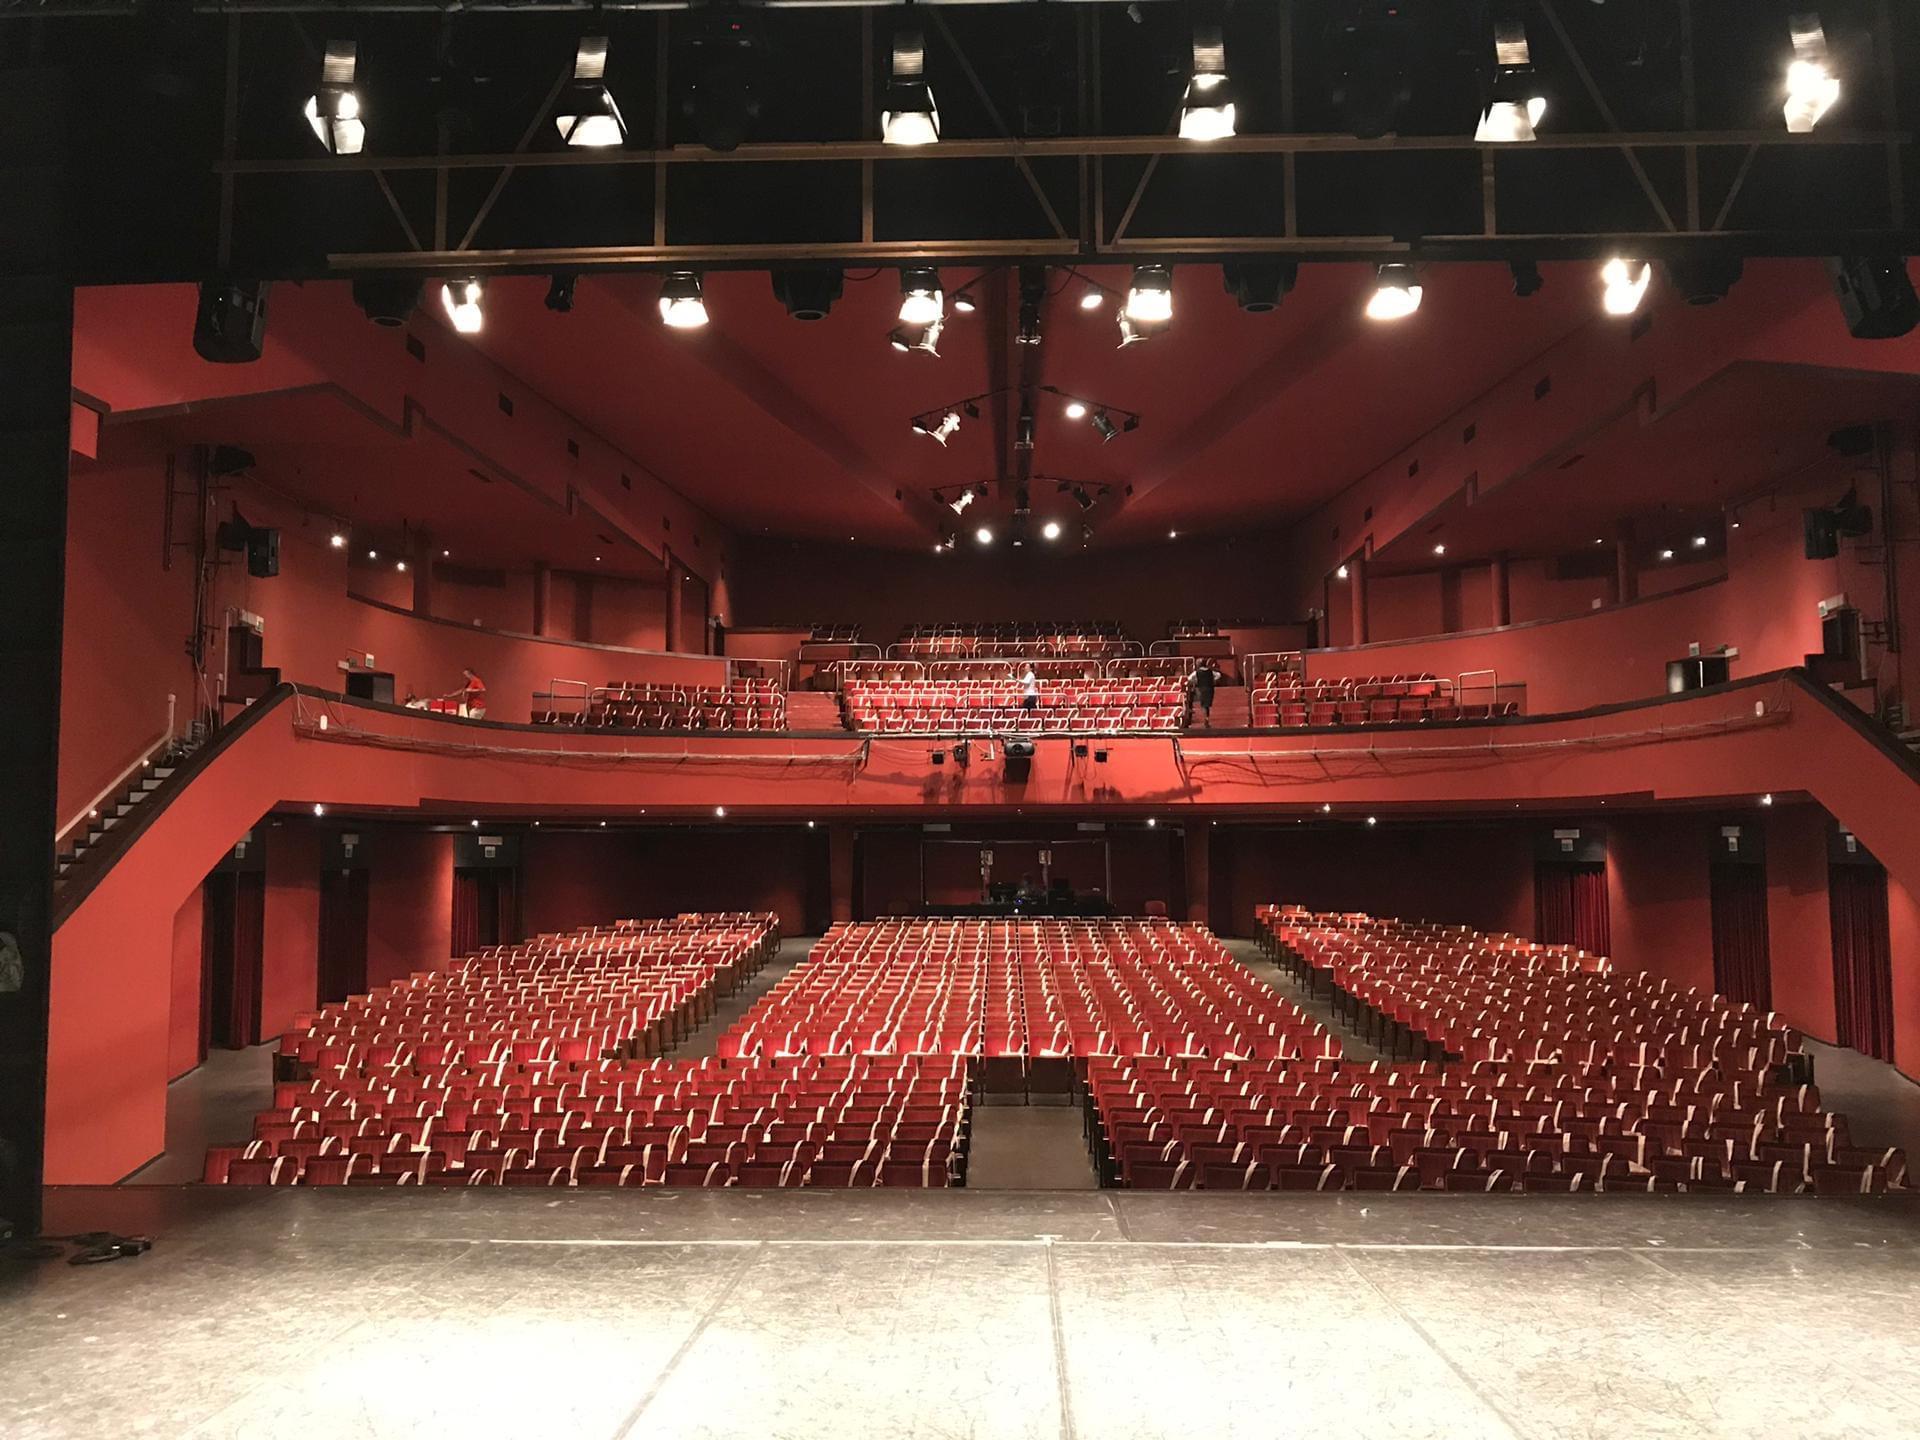 Teatro Carcano Millano- Ph.Pagina Facebook Teatro Carcano